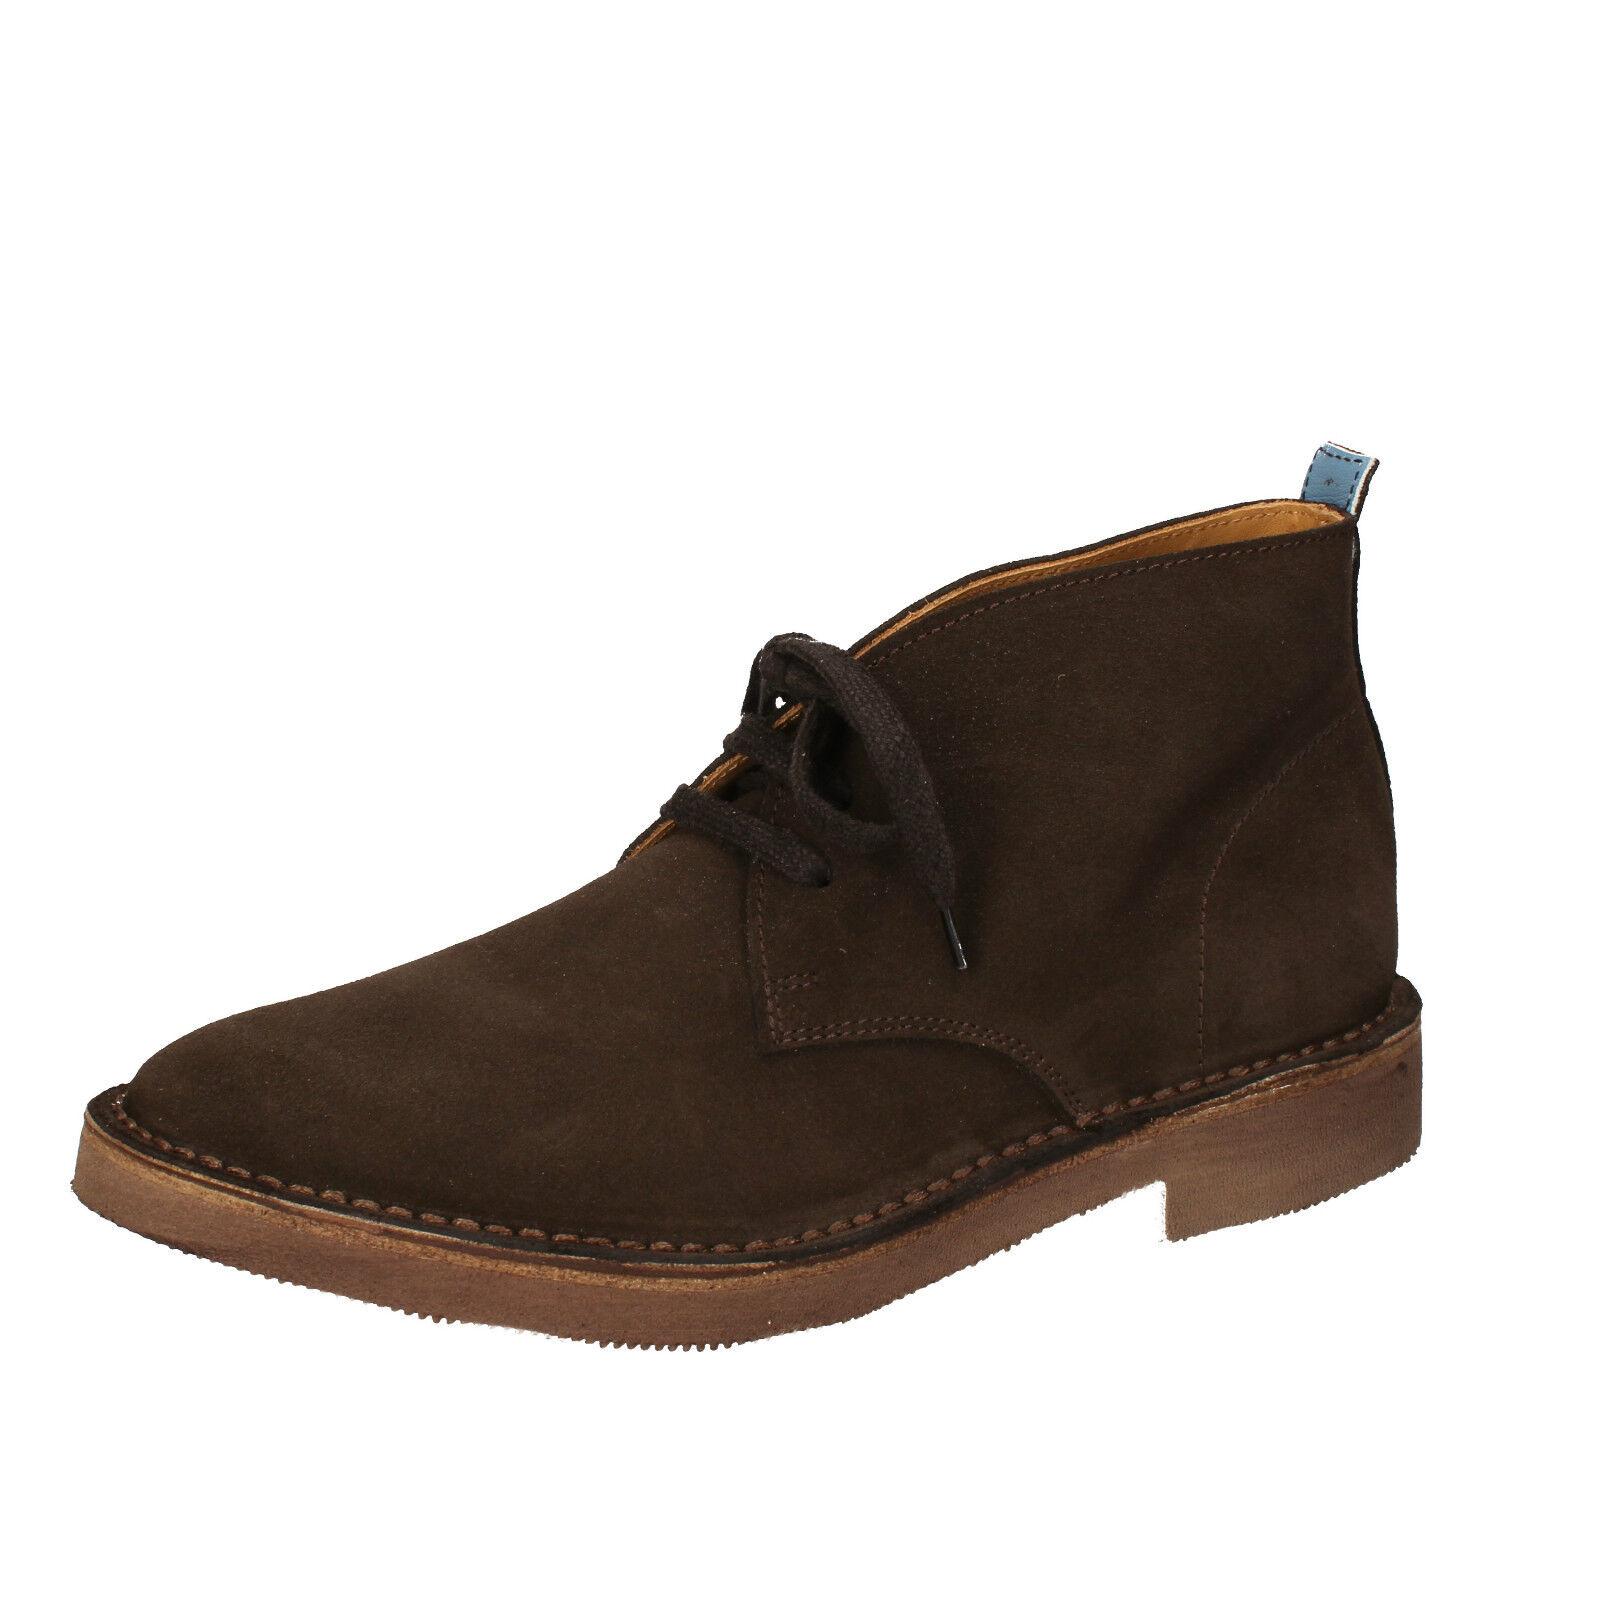 Herren schuhe MOMA 45 EU desert boots braun wildleder AB331-H